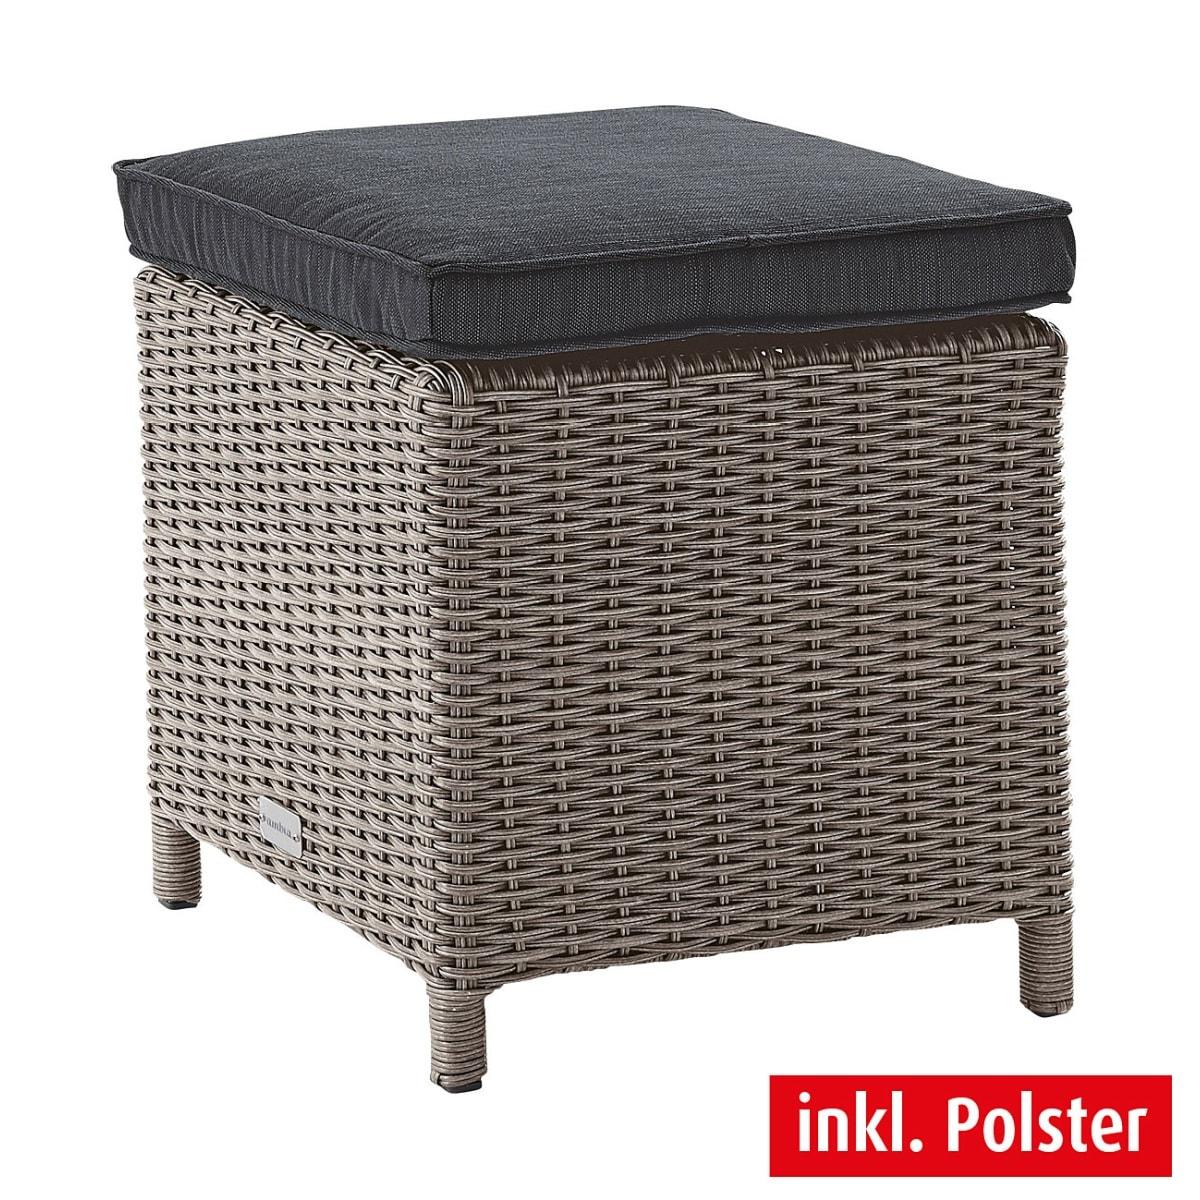 outdoor hocker mit kissen smoky kunststoffgeflecht grau. Black Bedroom Furniture Sets. Home Design Ideas